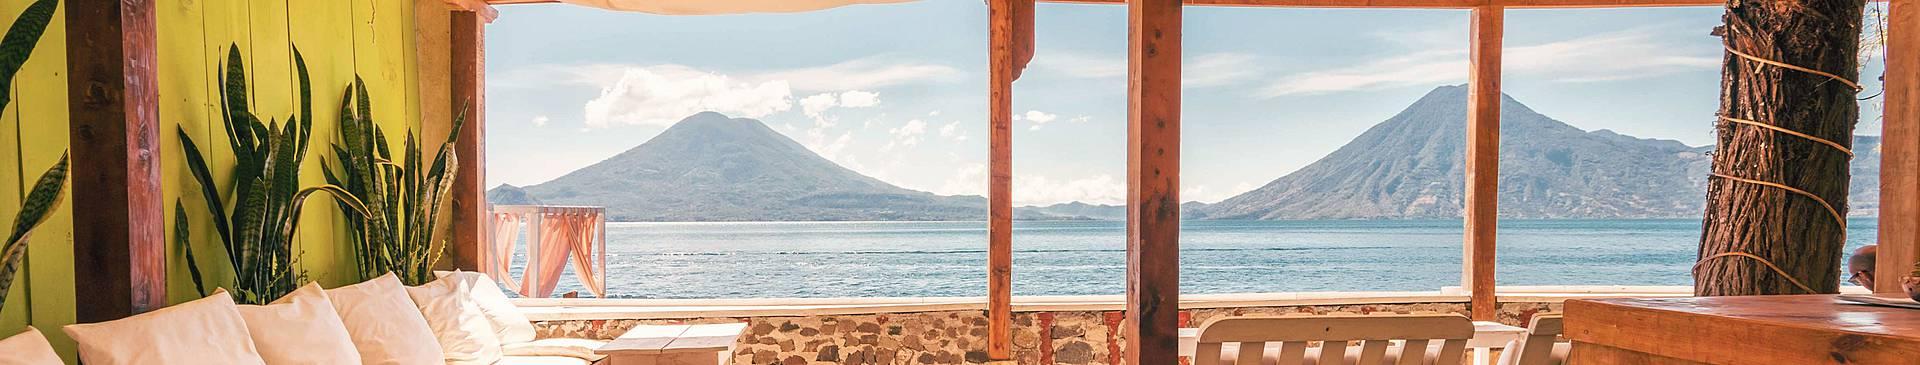 Luxury holidays in Guatemala